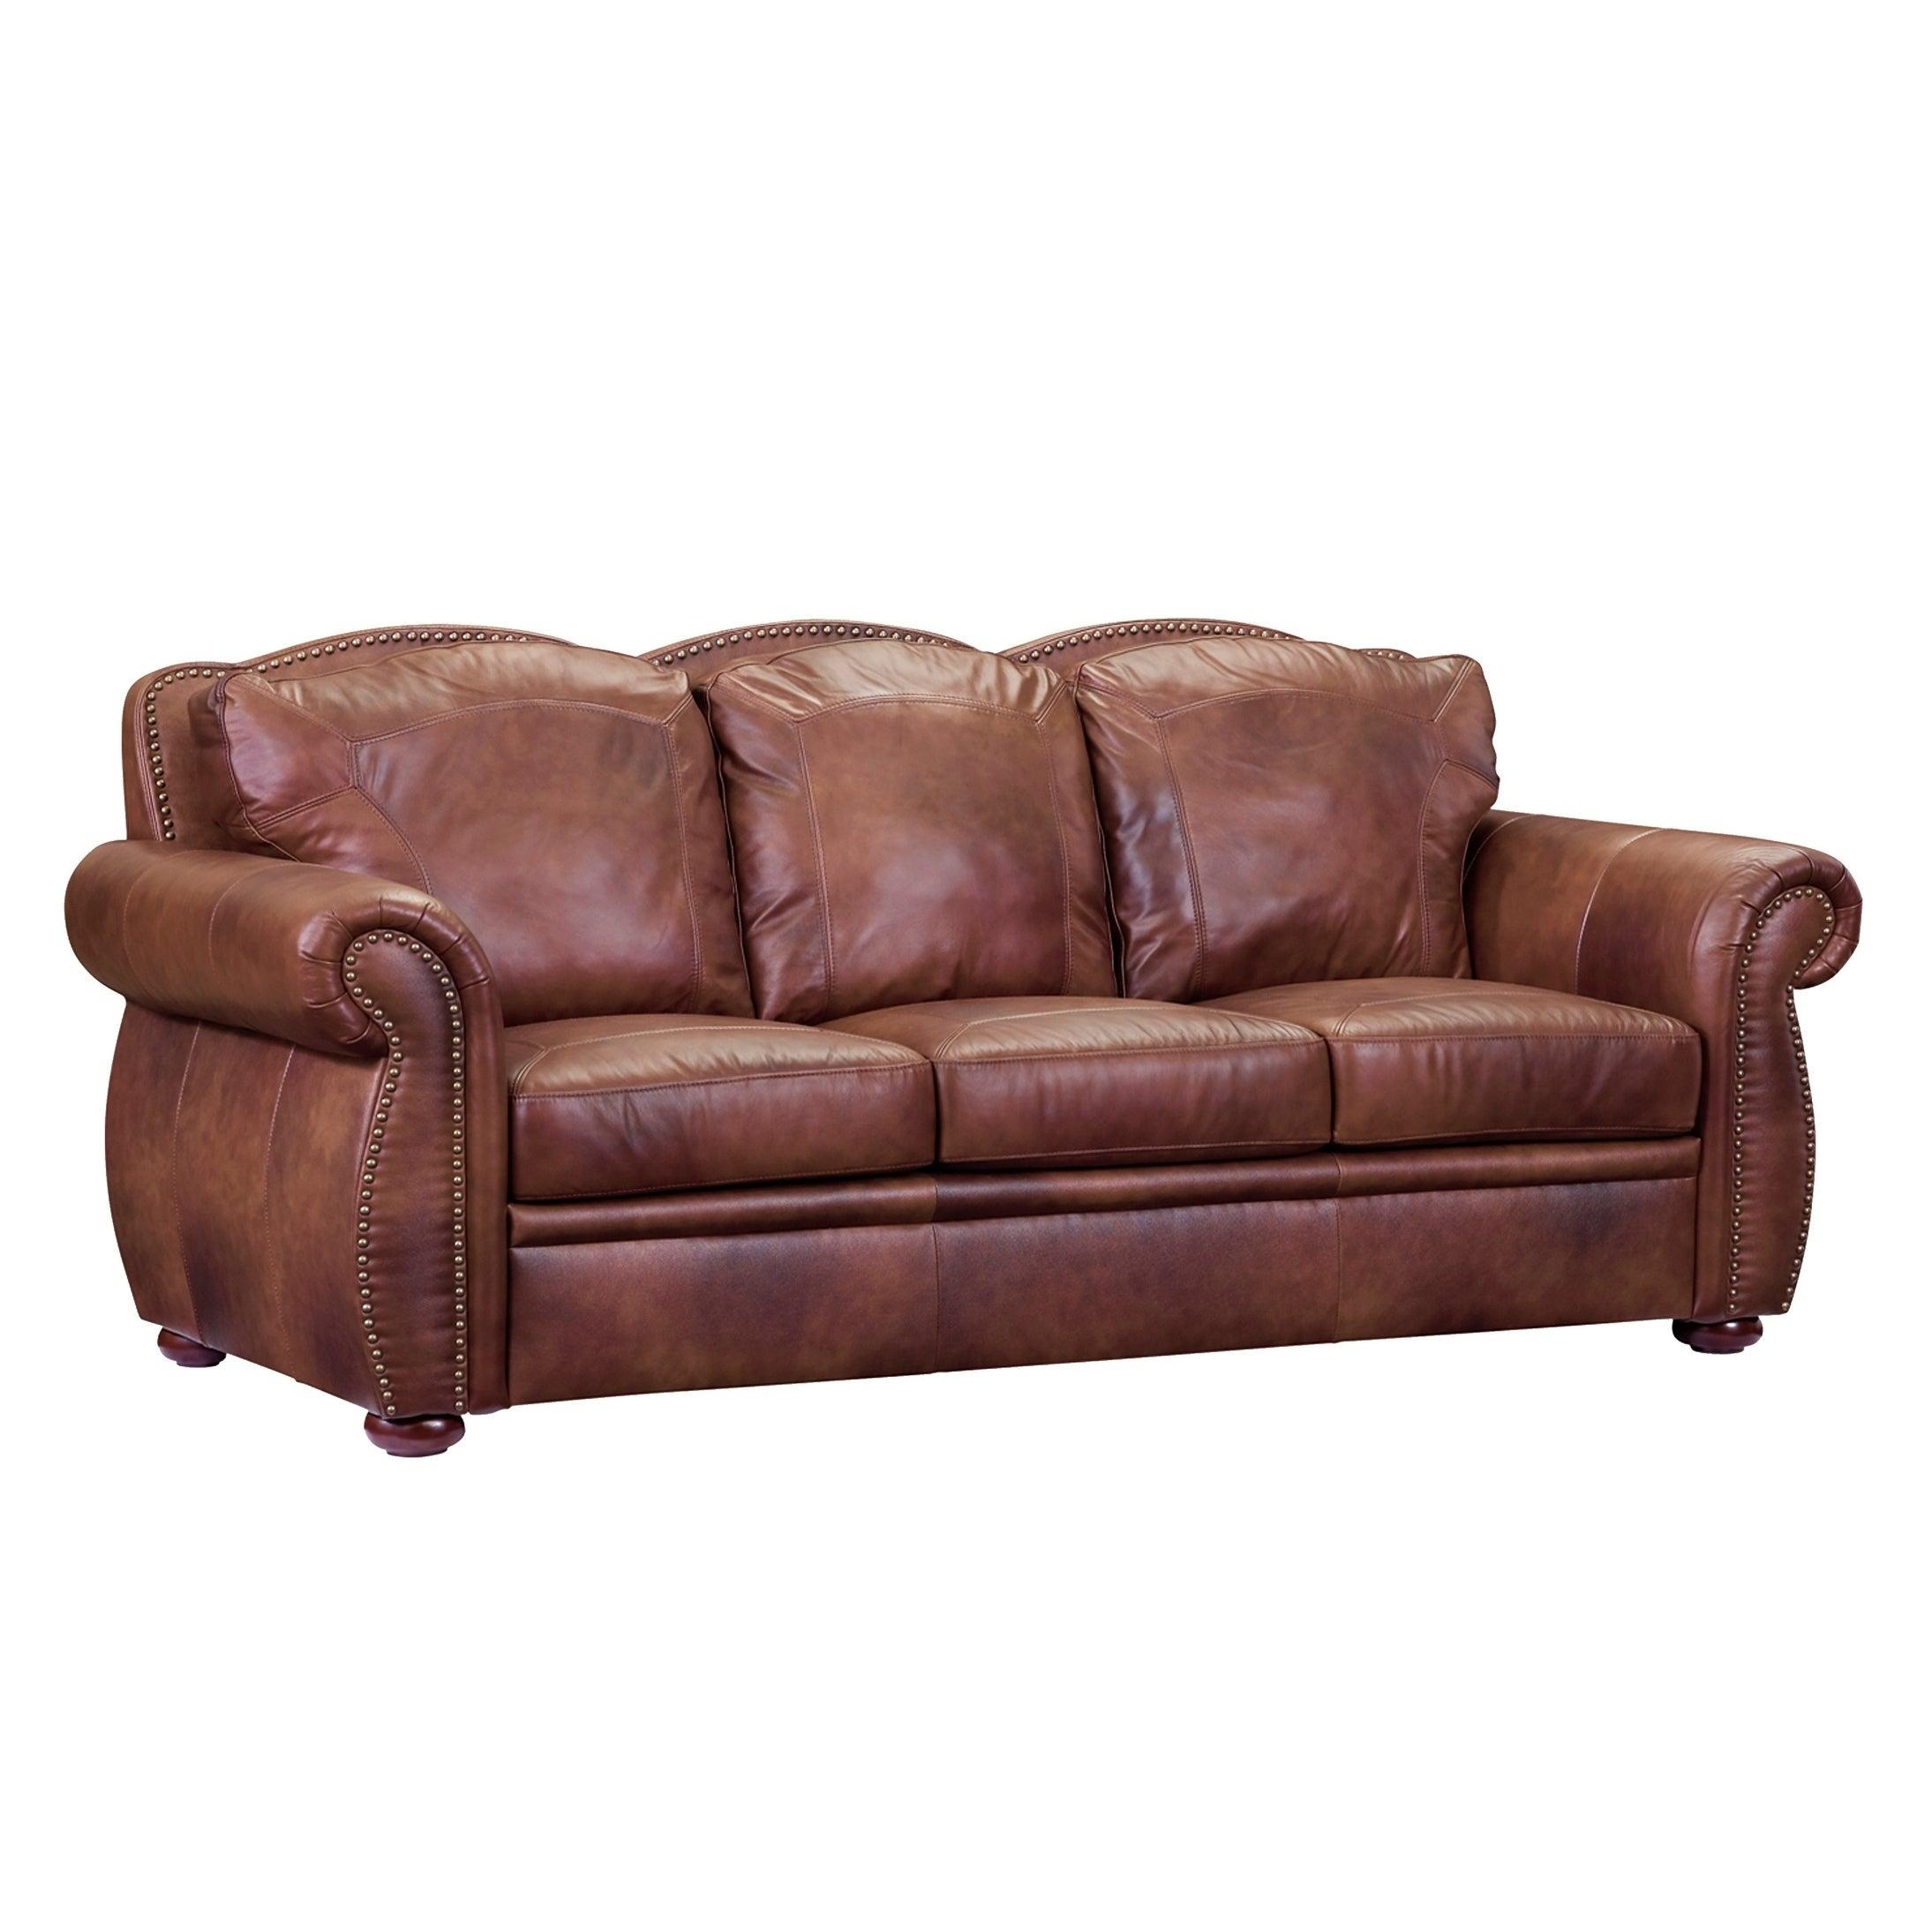 Shop Casey Top Grain Italian Leather Sofa - Free Shipping Today ...